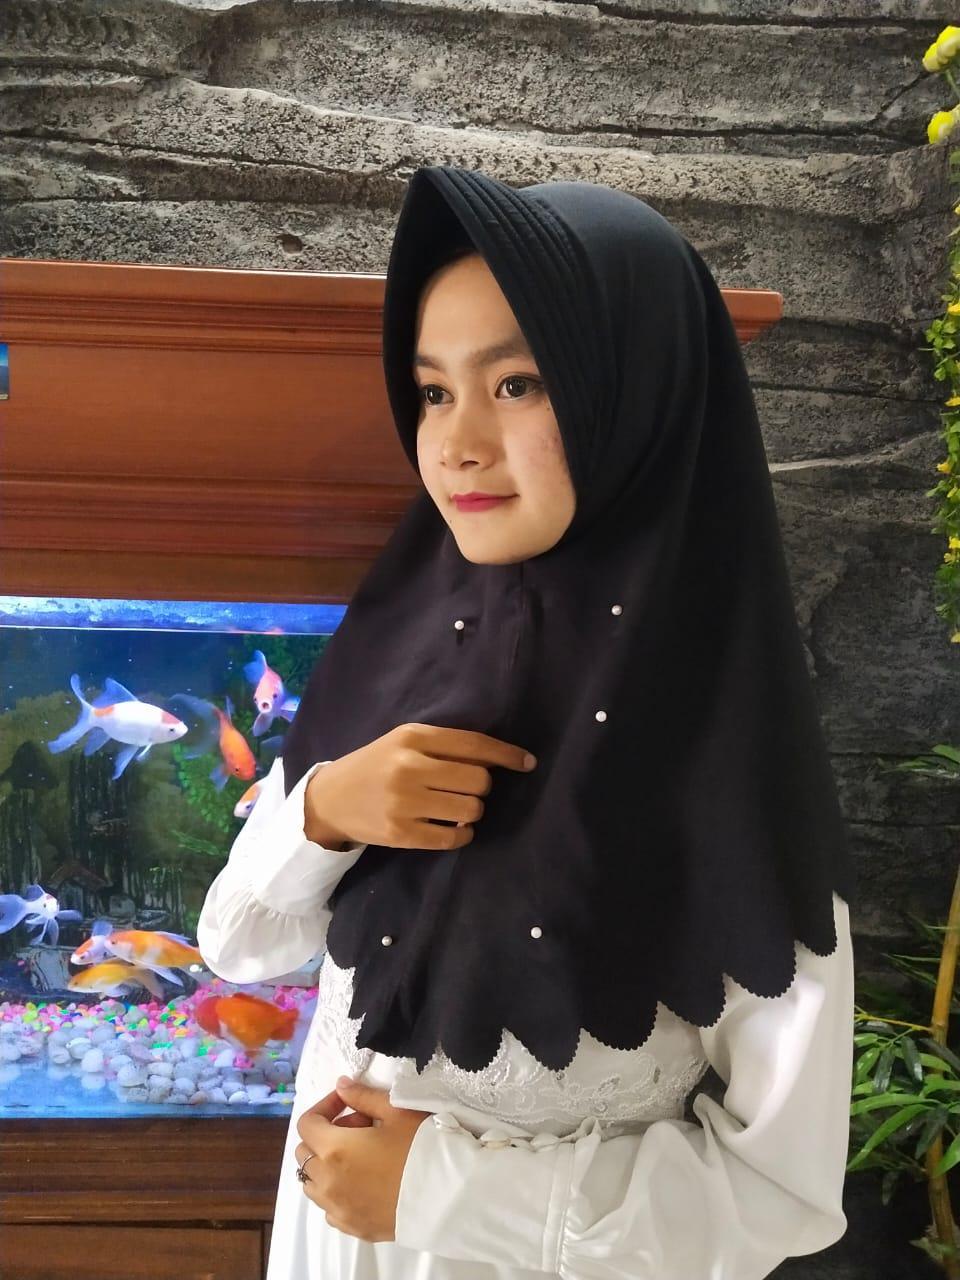 JILBAB / simple Pet LASER MUTIARA Hijab Instan JILBAB KHIMAR PET ANTEM HIJAB KERUDUNG INSTAN KHIMAR PET SIMPLE PET SYARI HIJAB INSTAN TERBARU